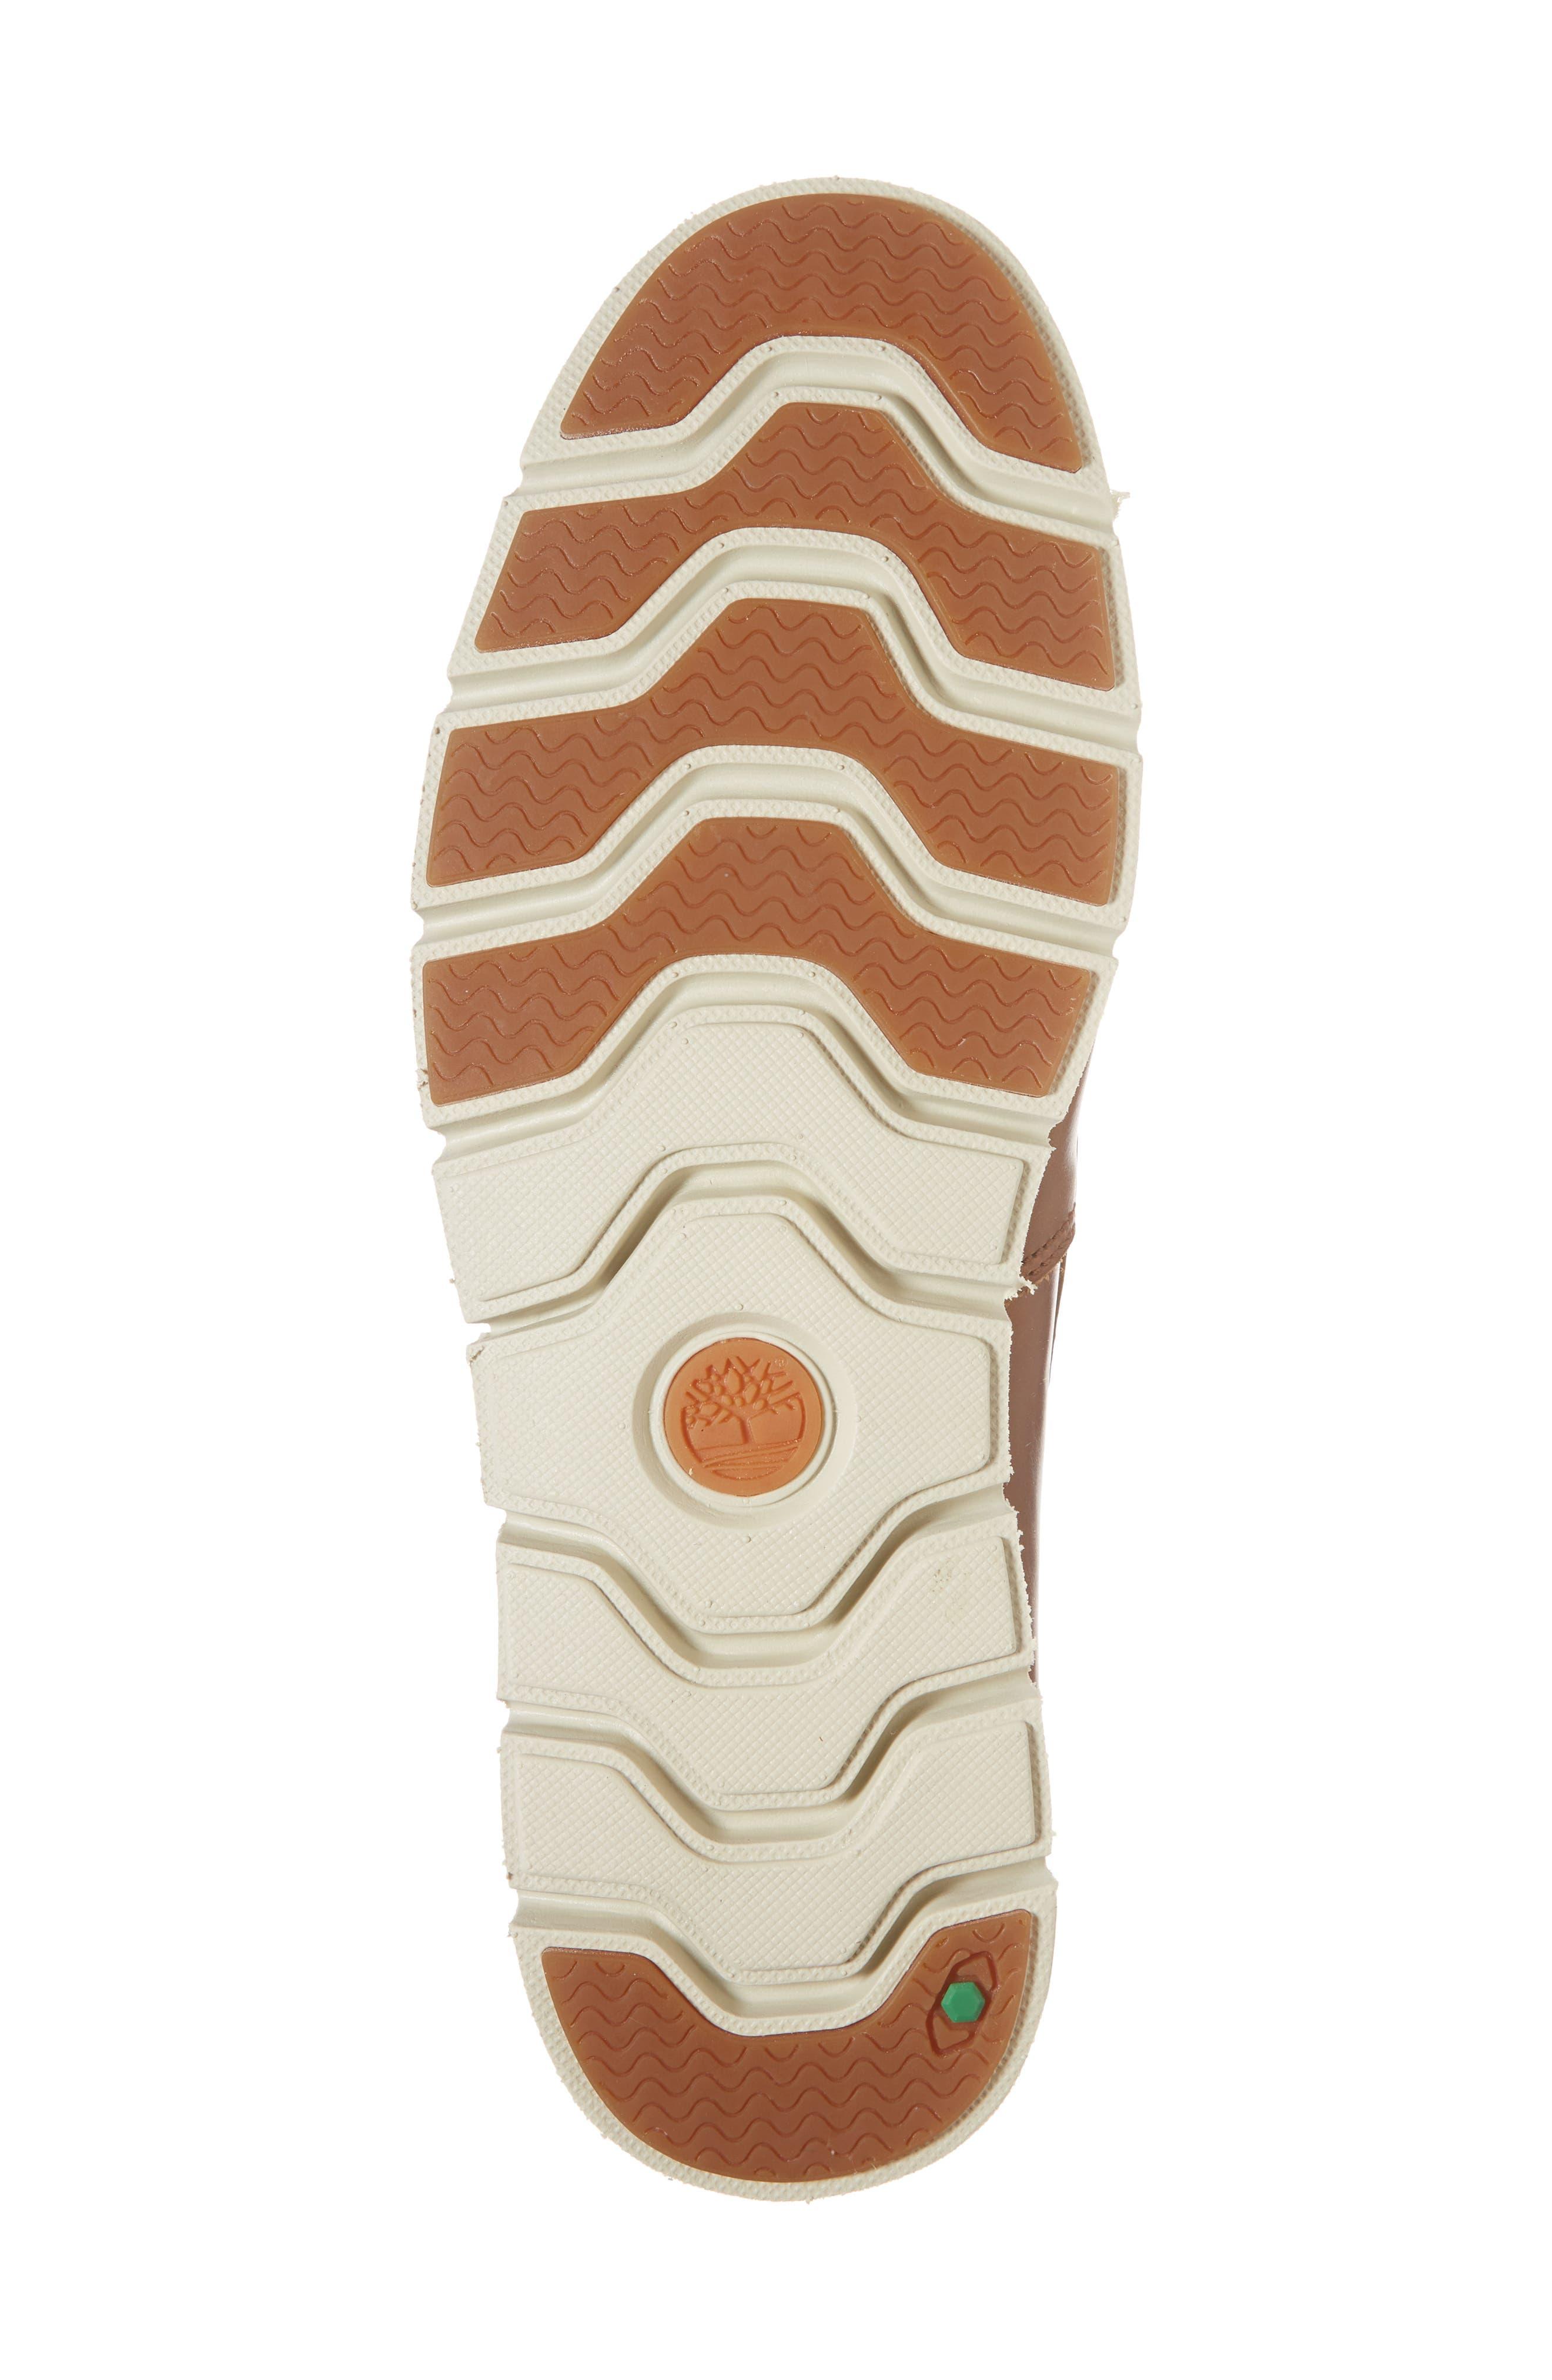 Tidelands Venetian Loafer,                             Alternate thumbnail 6, color,                             Brown